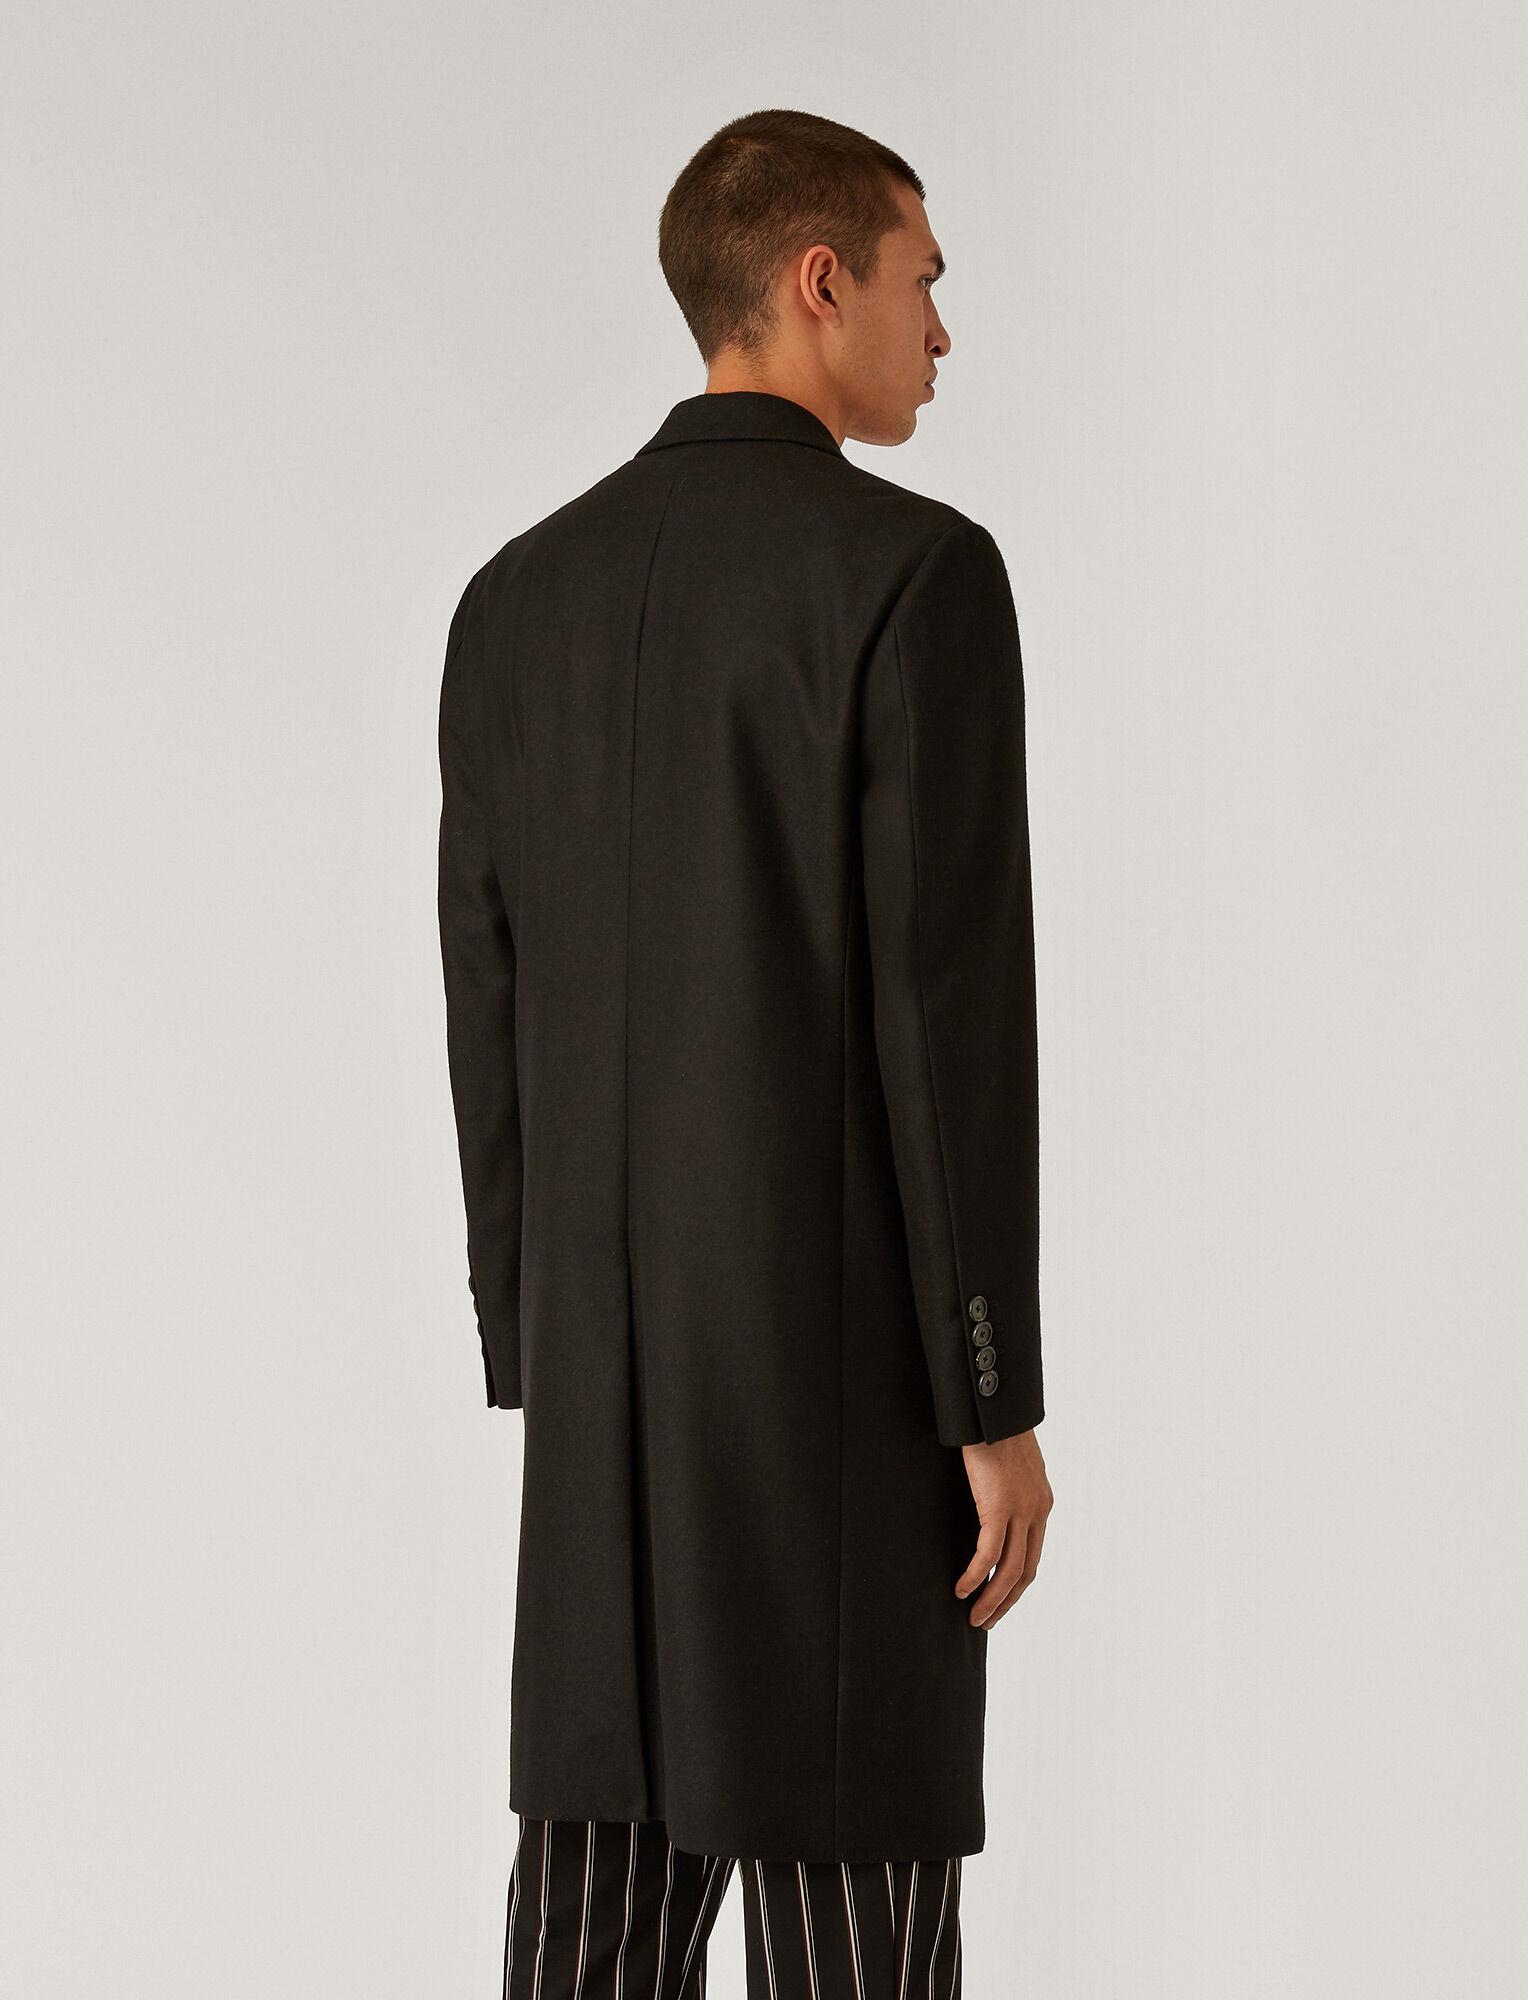 Joseph, Pure Cashmere Coat, in Black